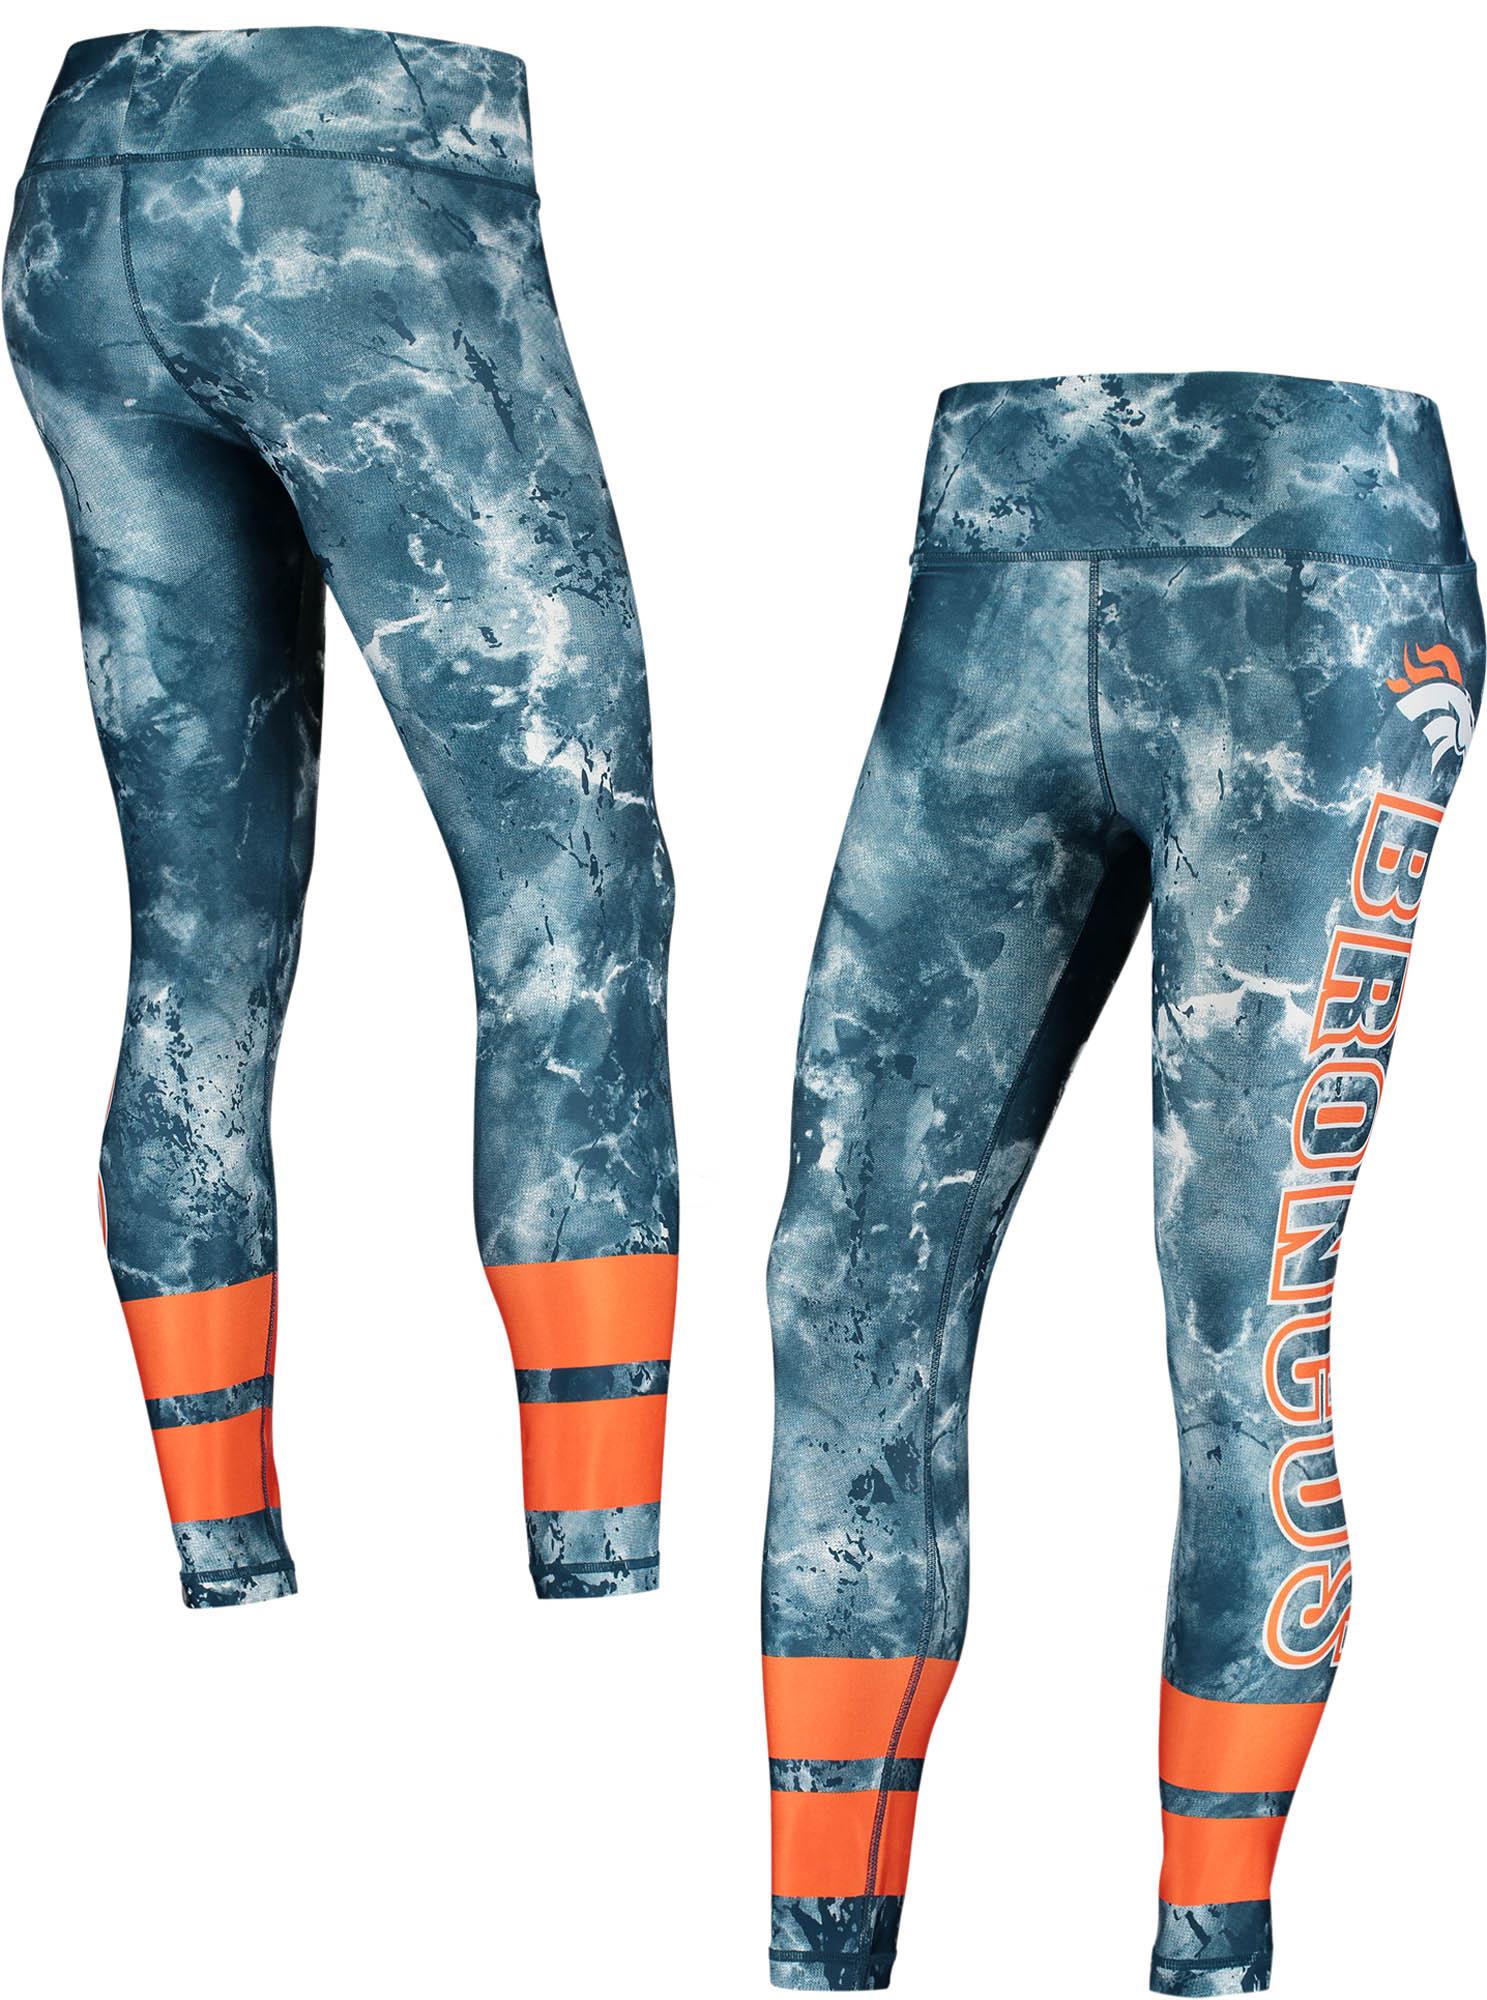 Denver Broncos Concepts Sport Women's Dormer Knit Leggings - Navy/Orange